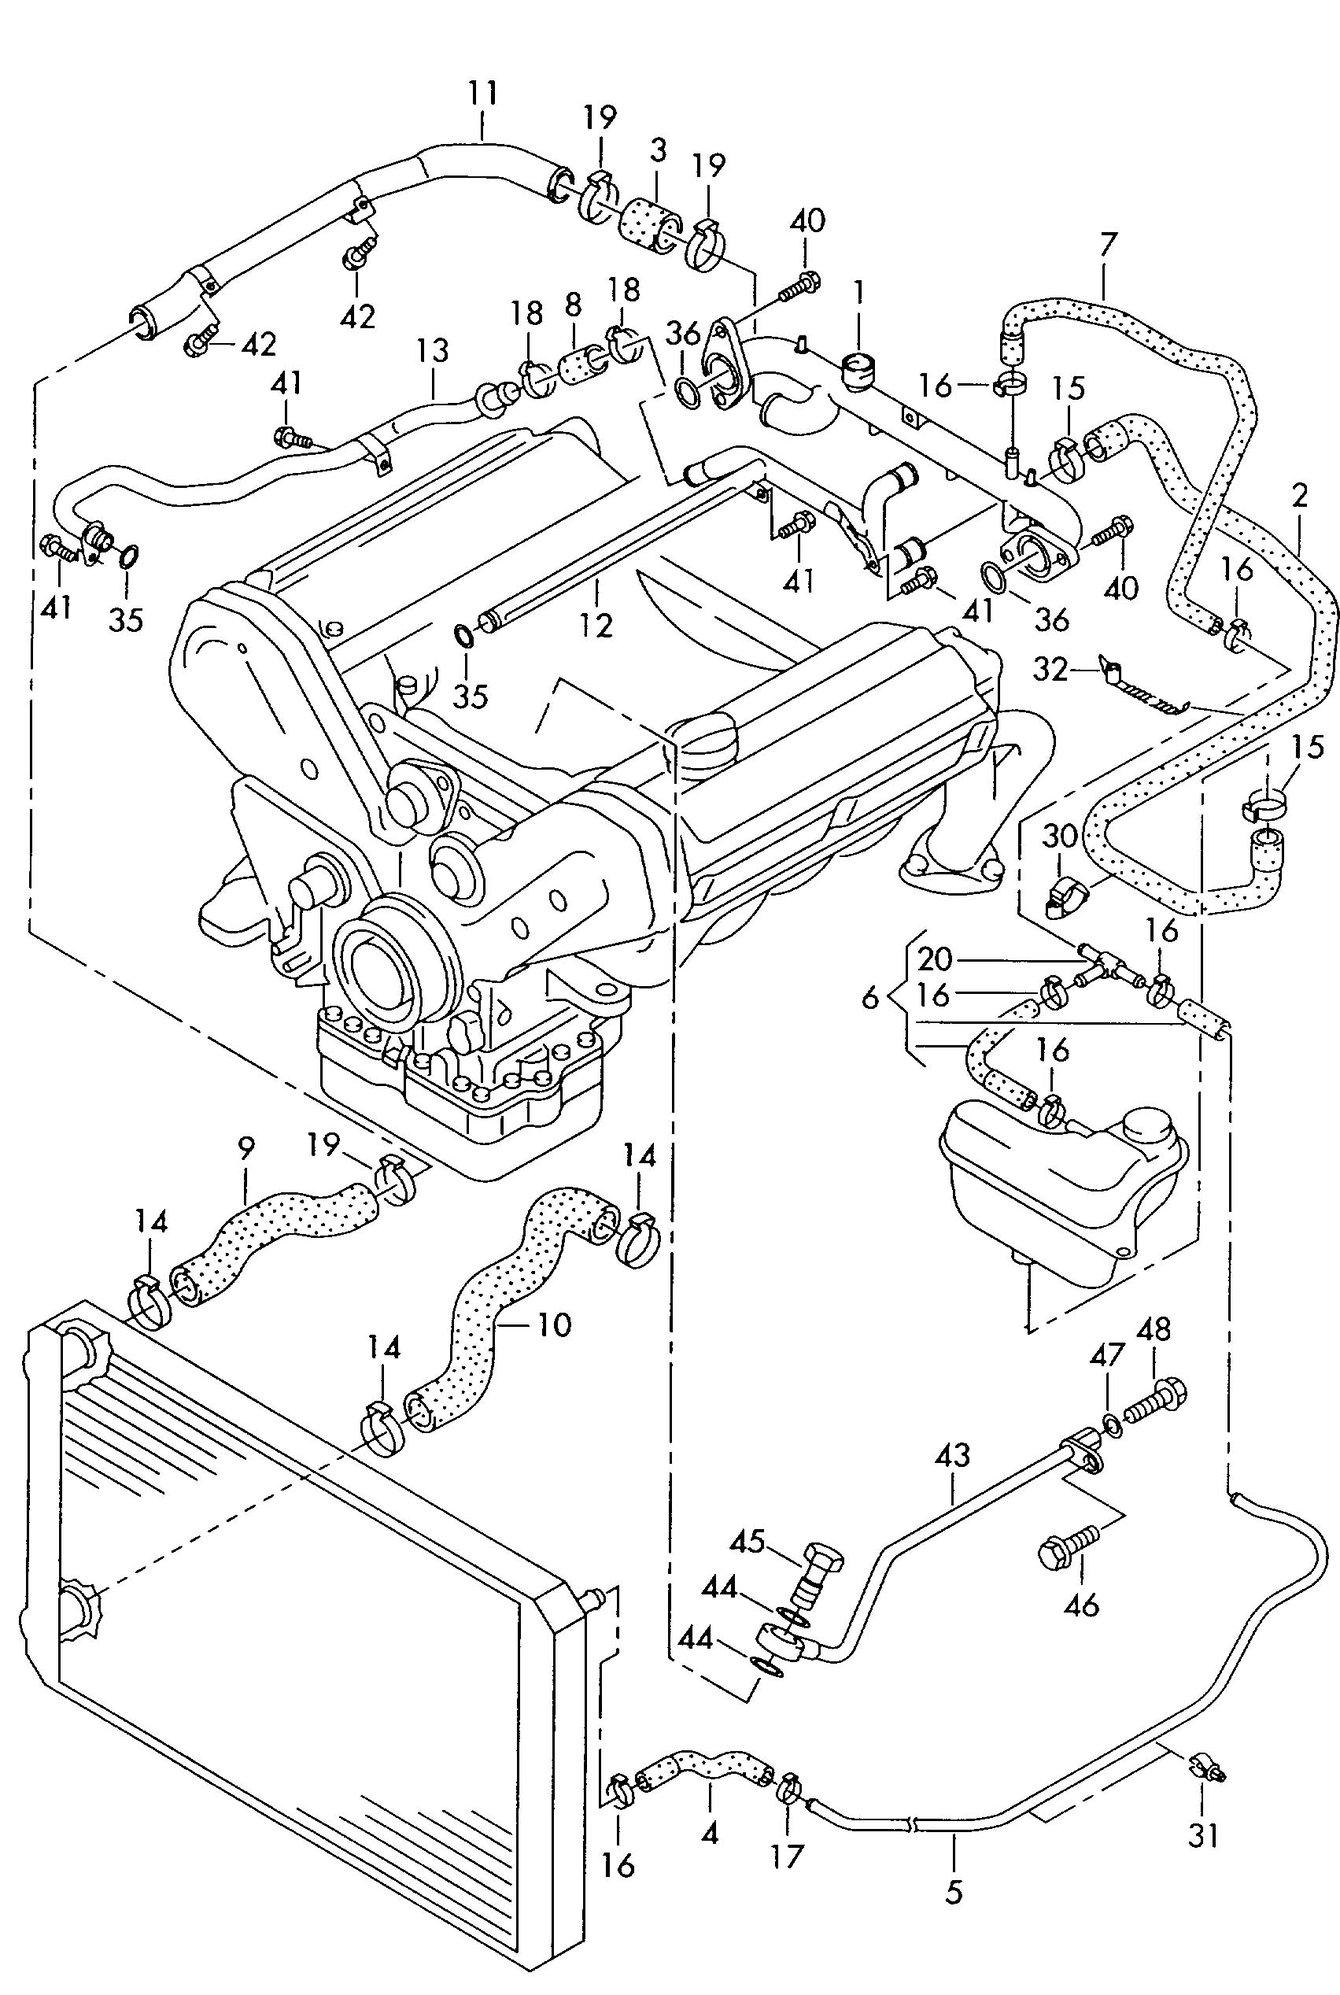 Rear Coolant Pipe Leak